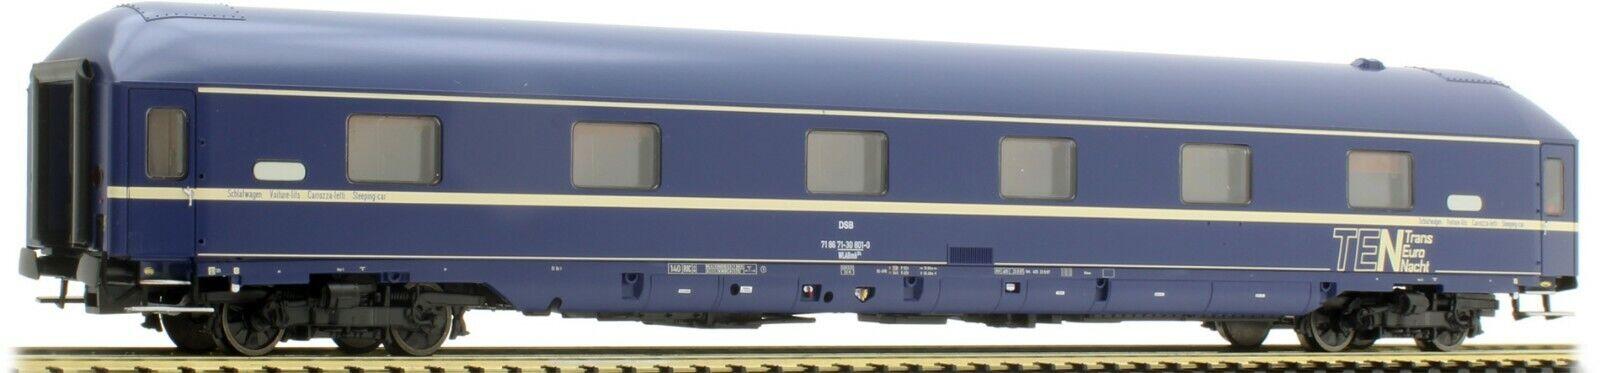 ACME 52383 autoROZZA LETTI DSB WLABmh174 WLABmh174 WLABmh174 livrea blu fascia bianca, 4 porte 661f32